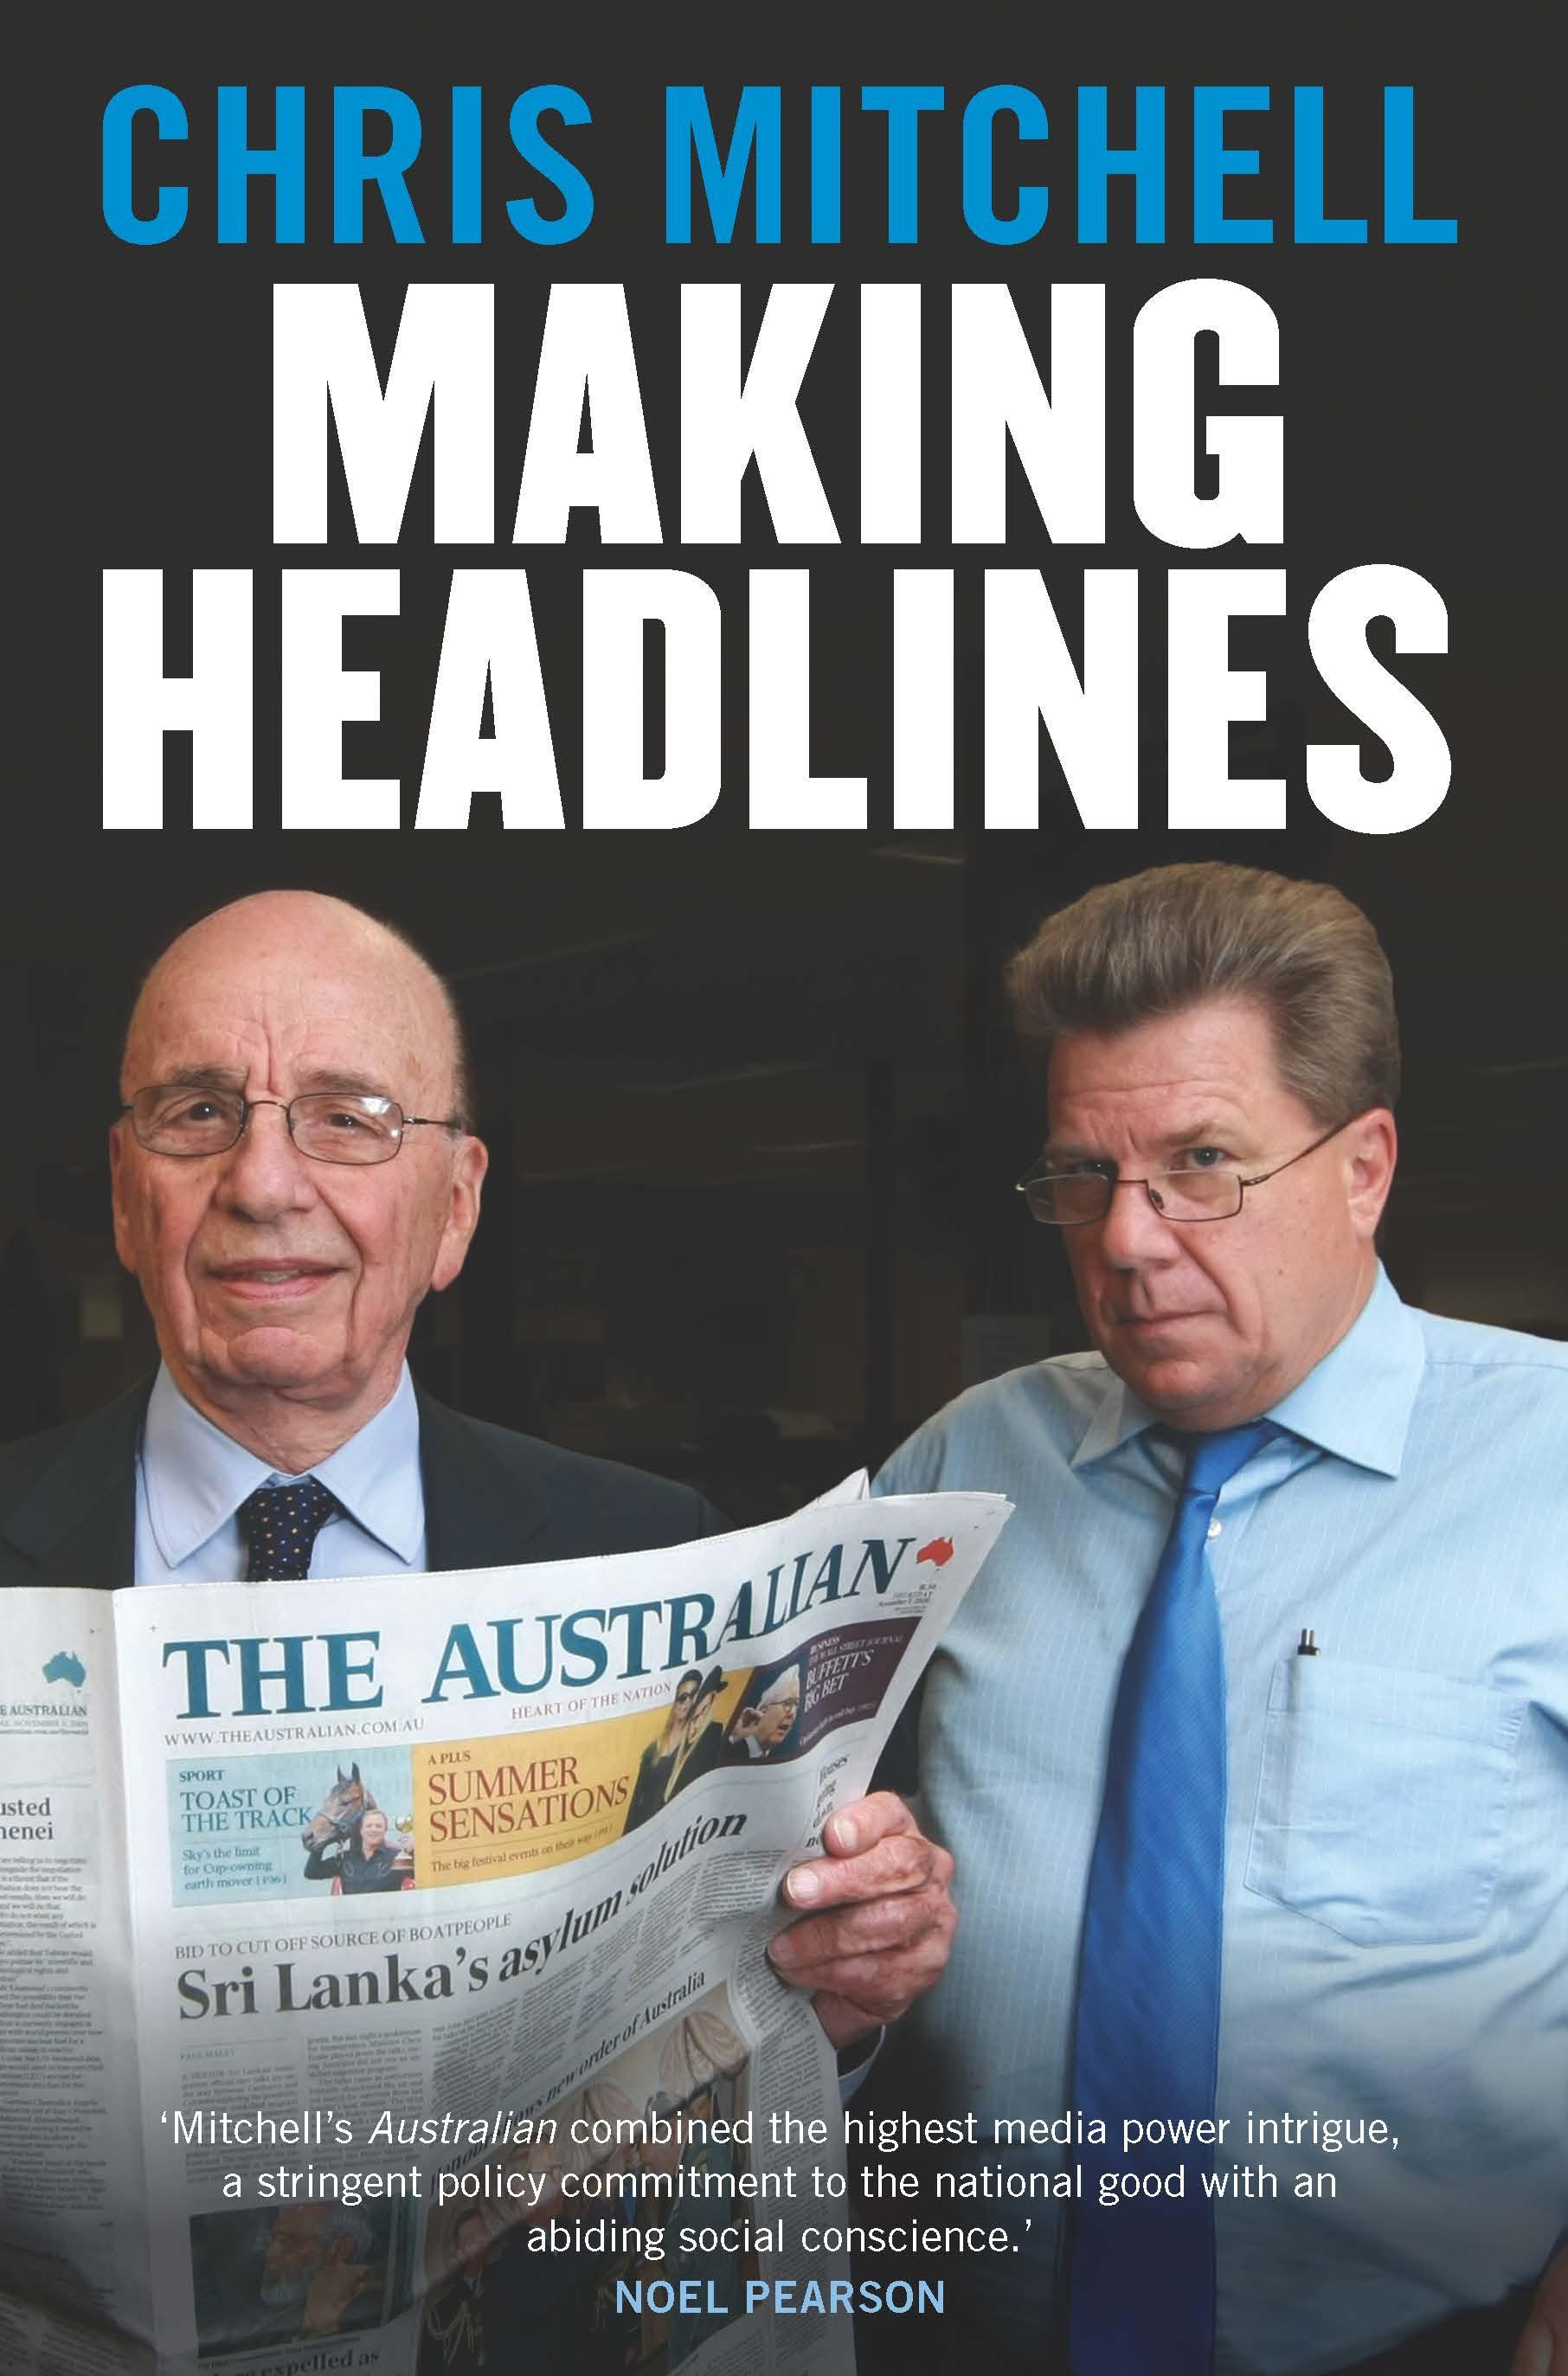 Download Ebook Making Headlines by Chris Mitchell Pdf